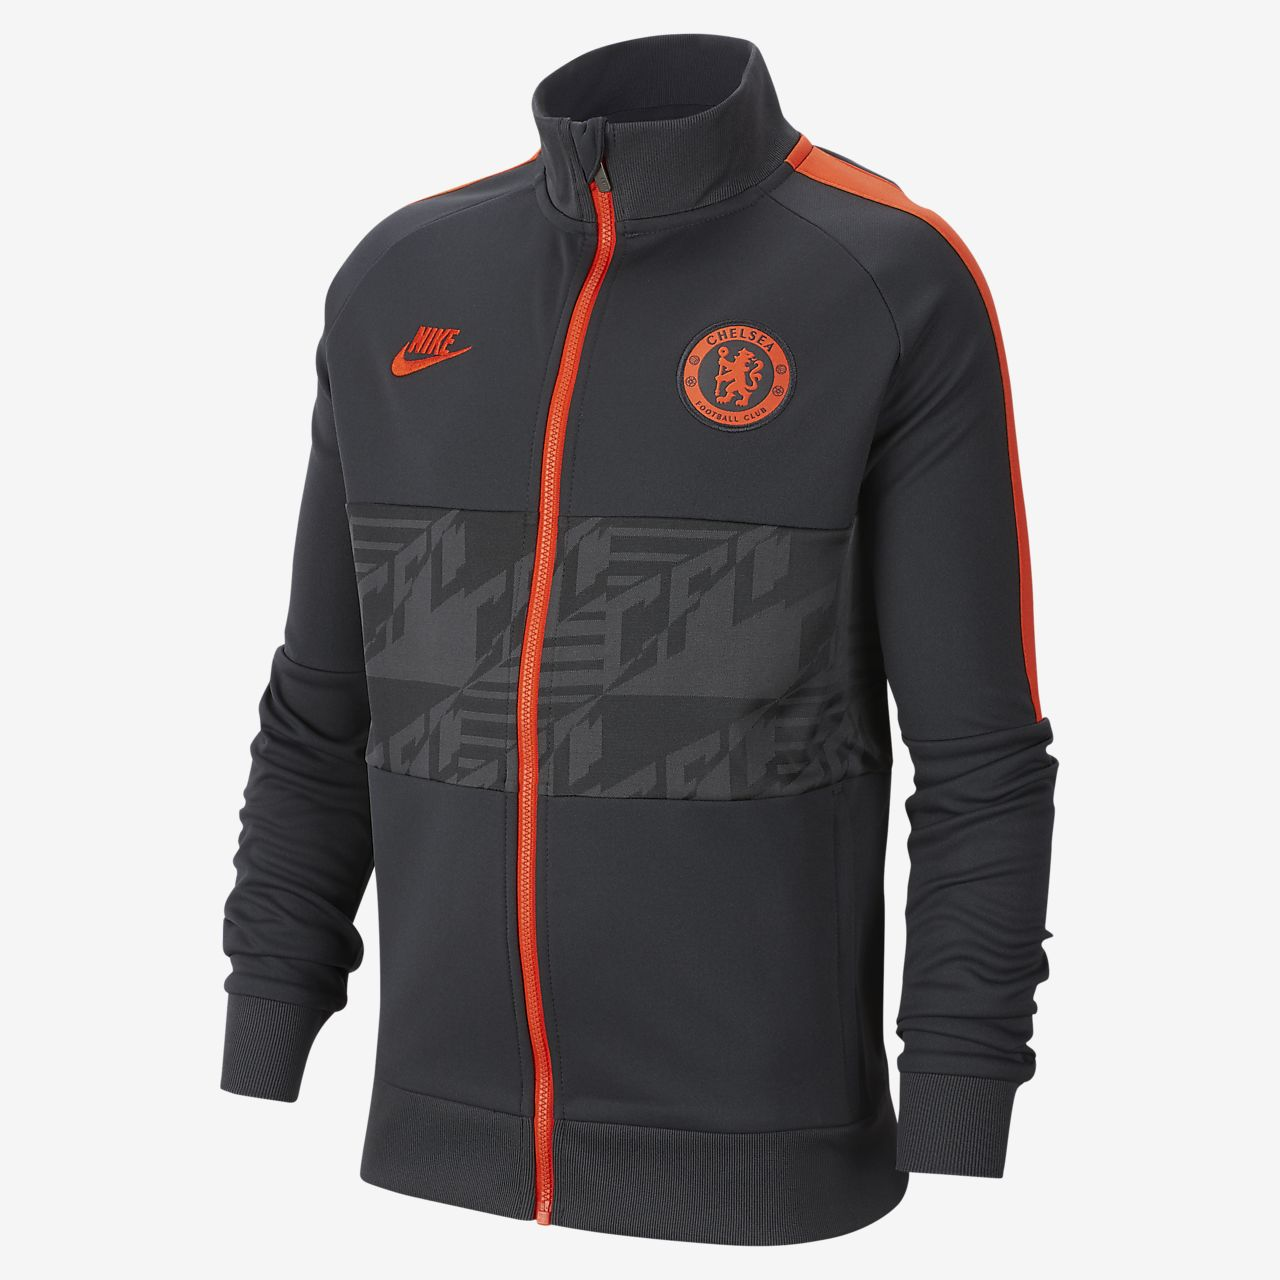 Chelsea FC jakke til store børn. Nike DK